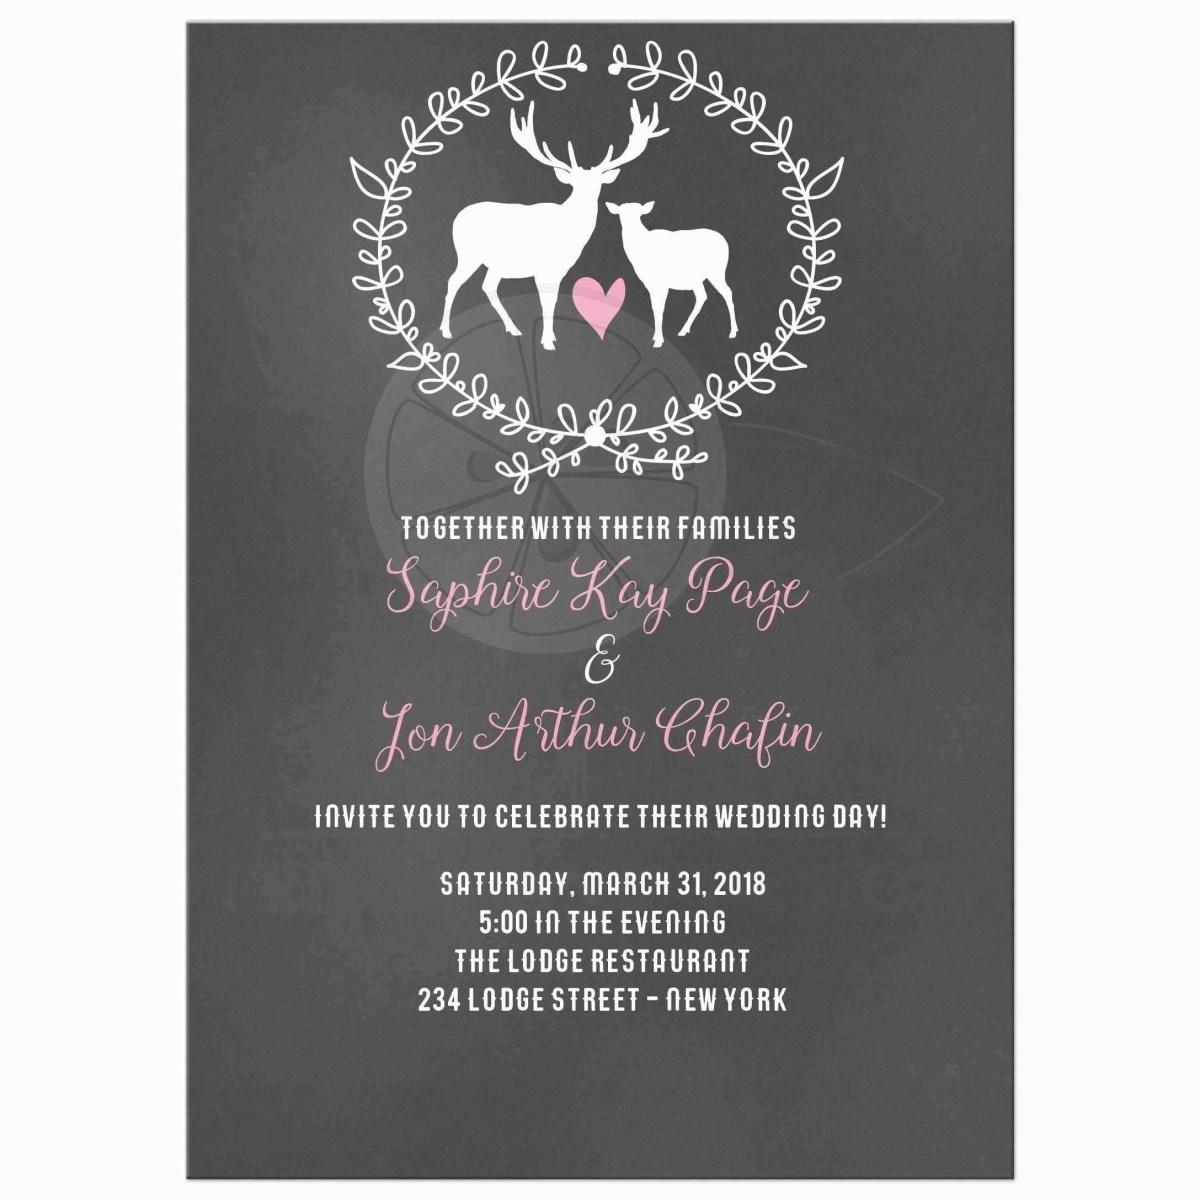 Free Wedding Shower Invitation Templates Free Bridal Shower Invitation Templates Downloads Download Ba